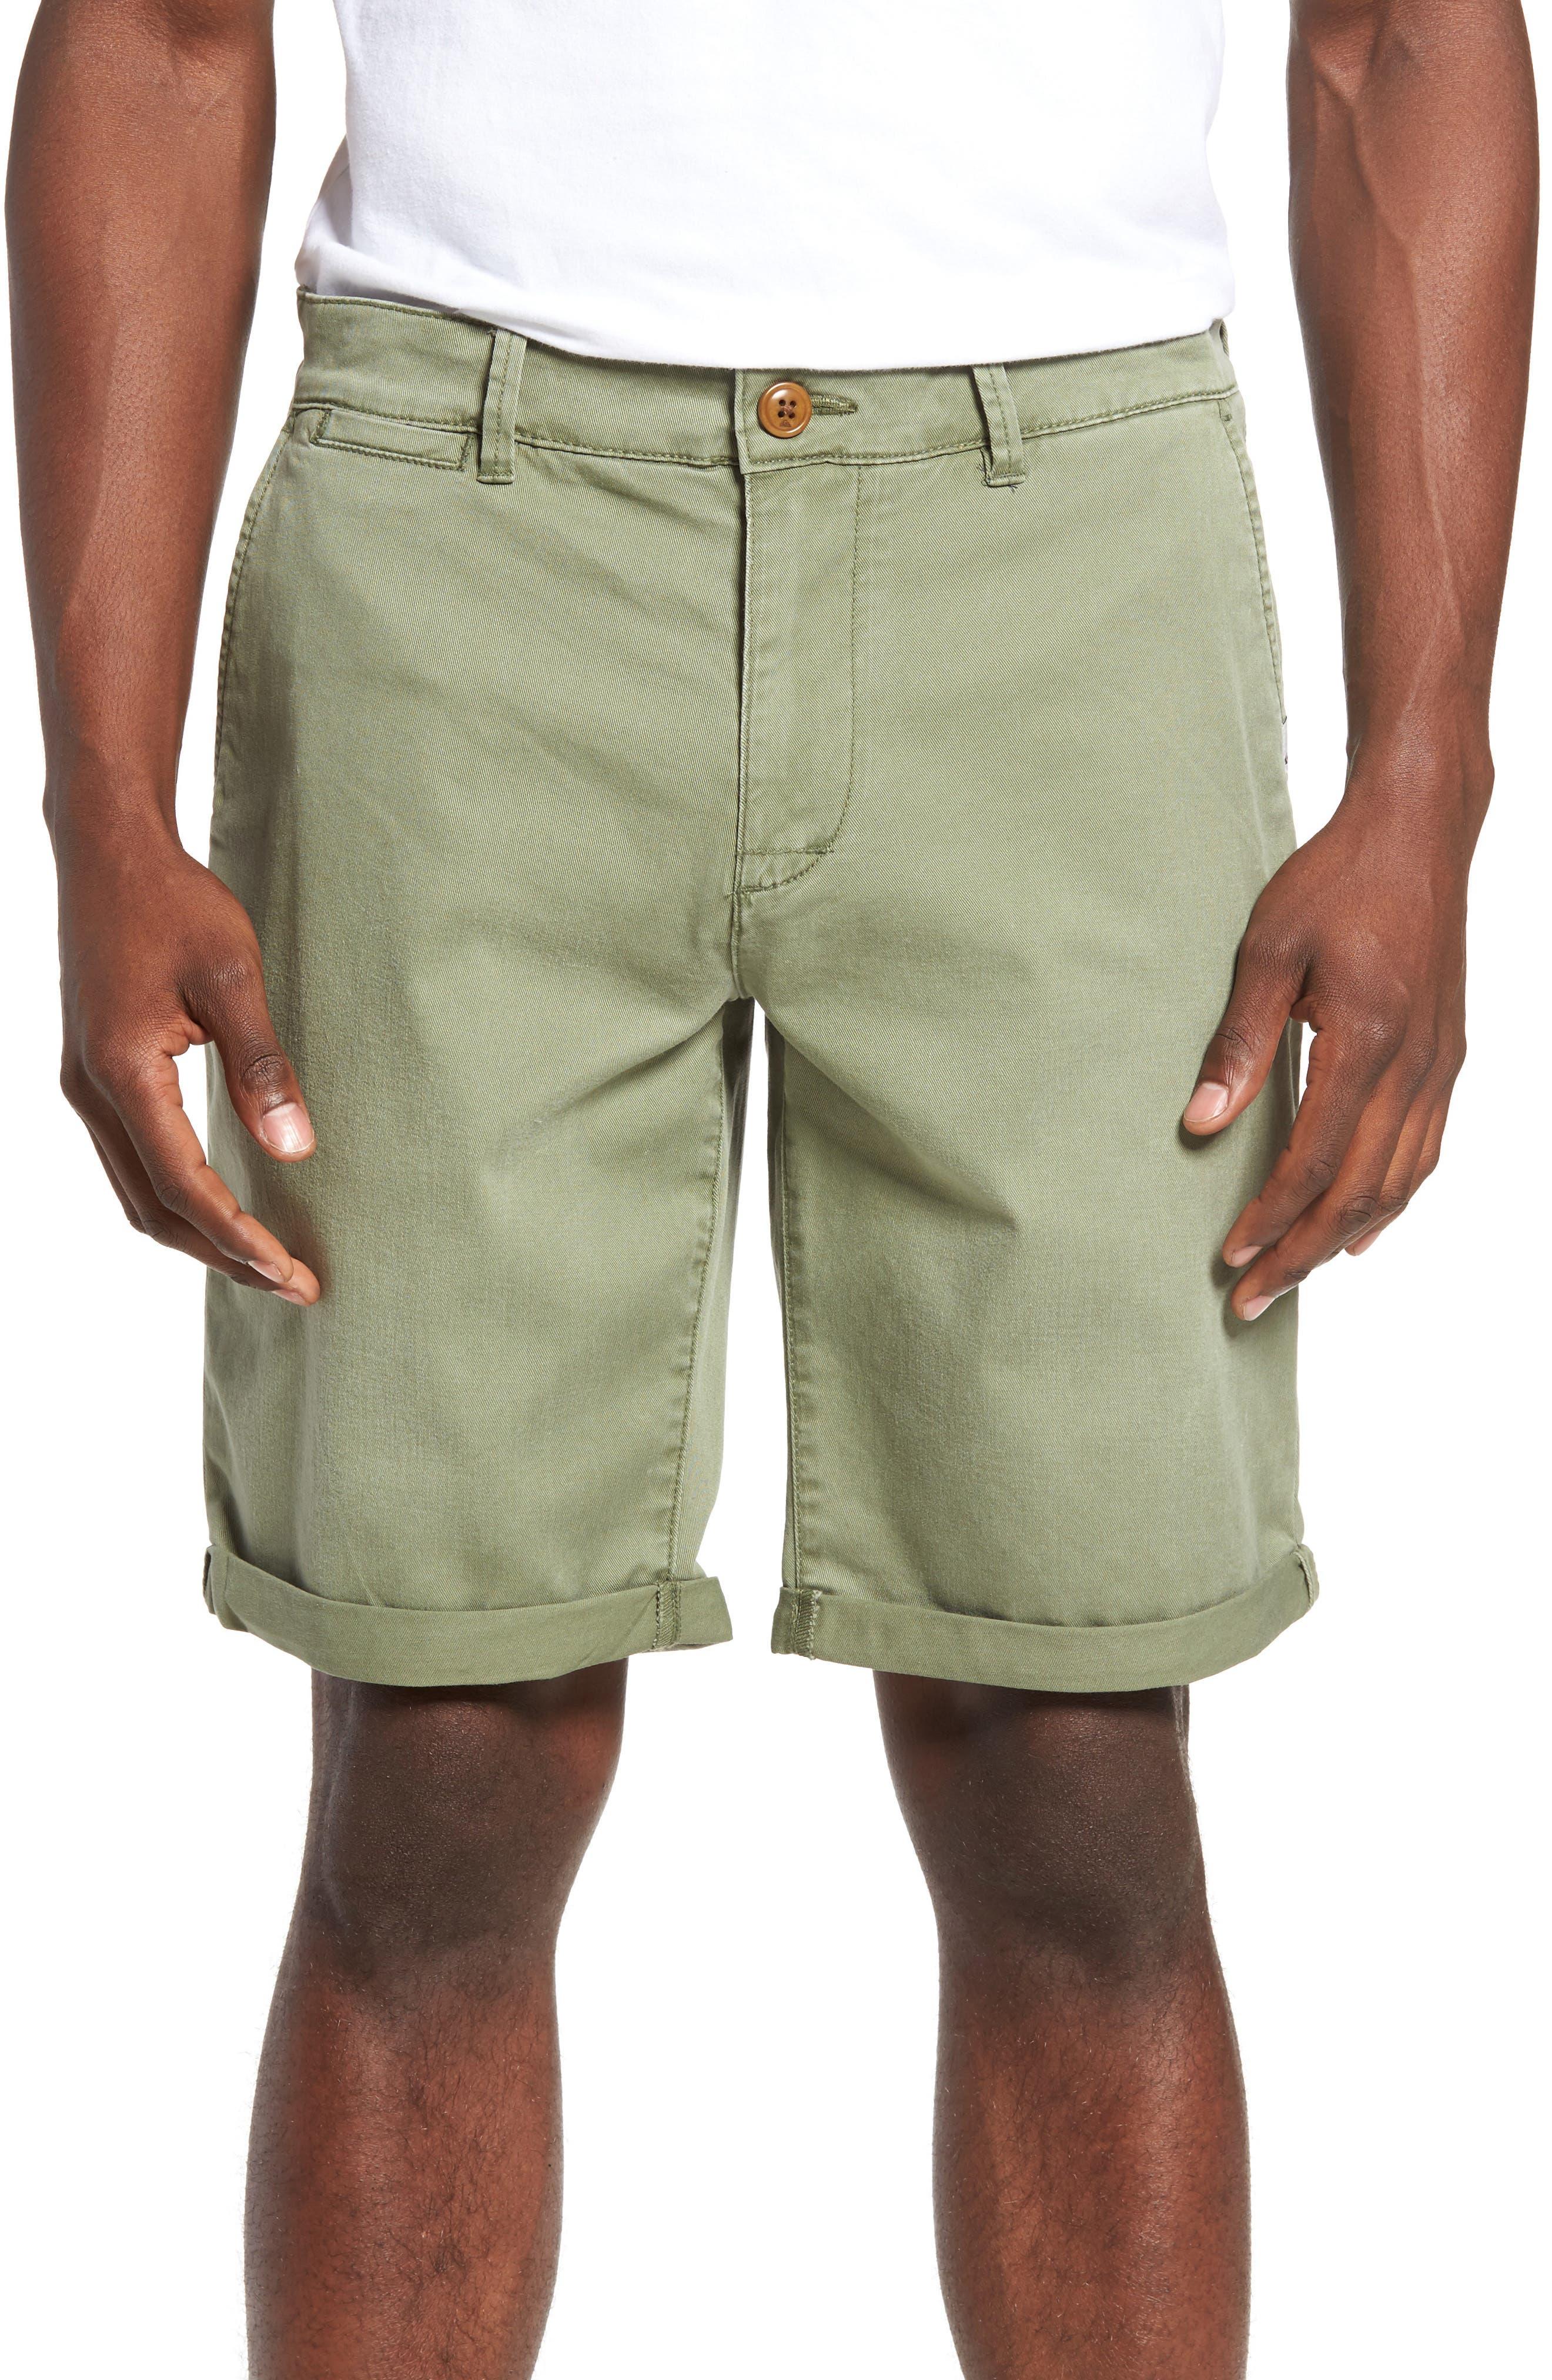 Quiksilver Krandy Chino Shorts (Regular & Big)